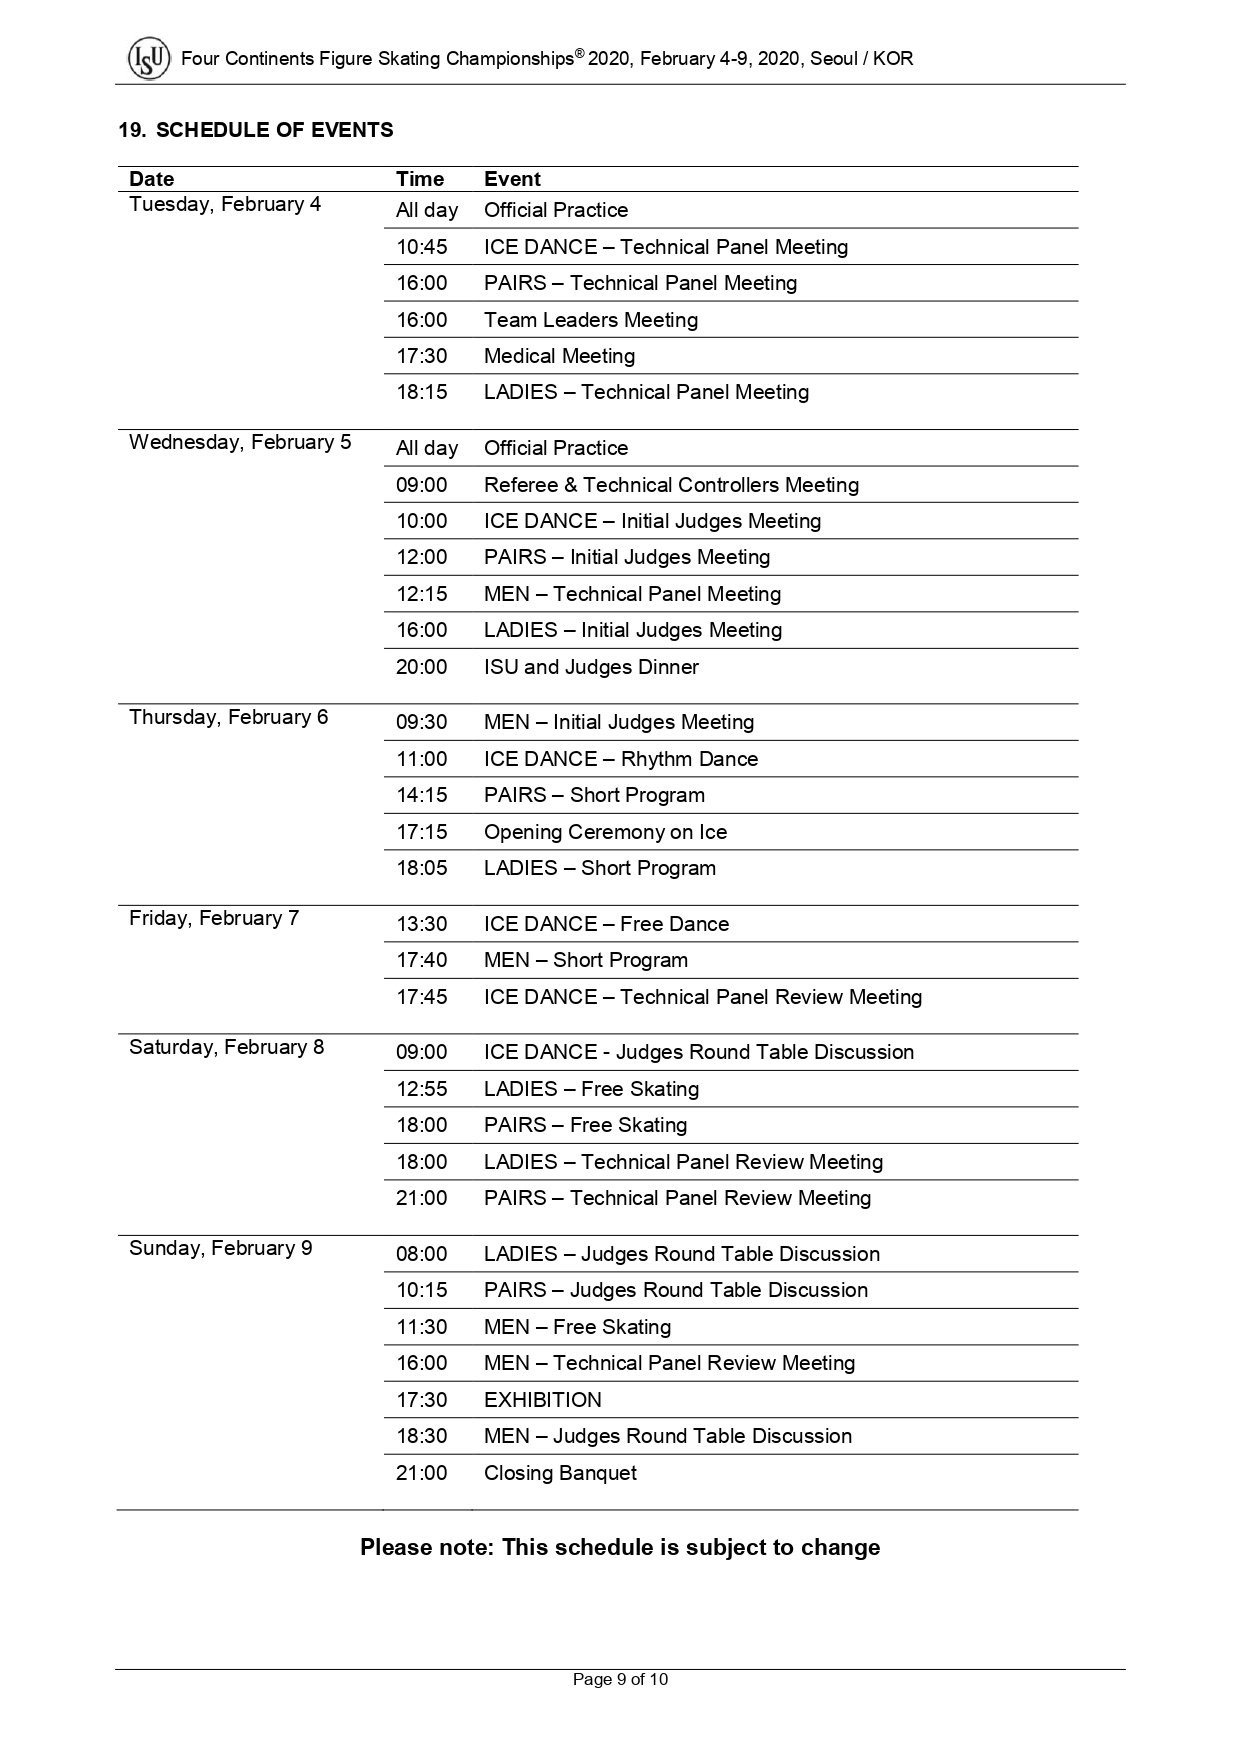 Командный Чемпионат Мира  |ISU Four Continents Figure Skating Championships/4-9 февраля 2020/ Сеул (Корея) EDeGqIIXkAYI-3E?format=jpg&name=large